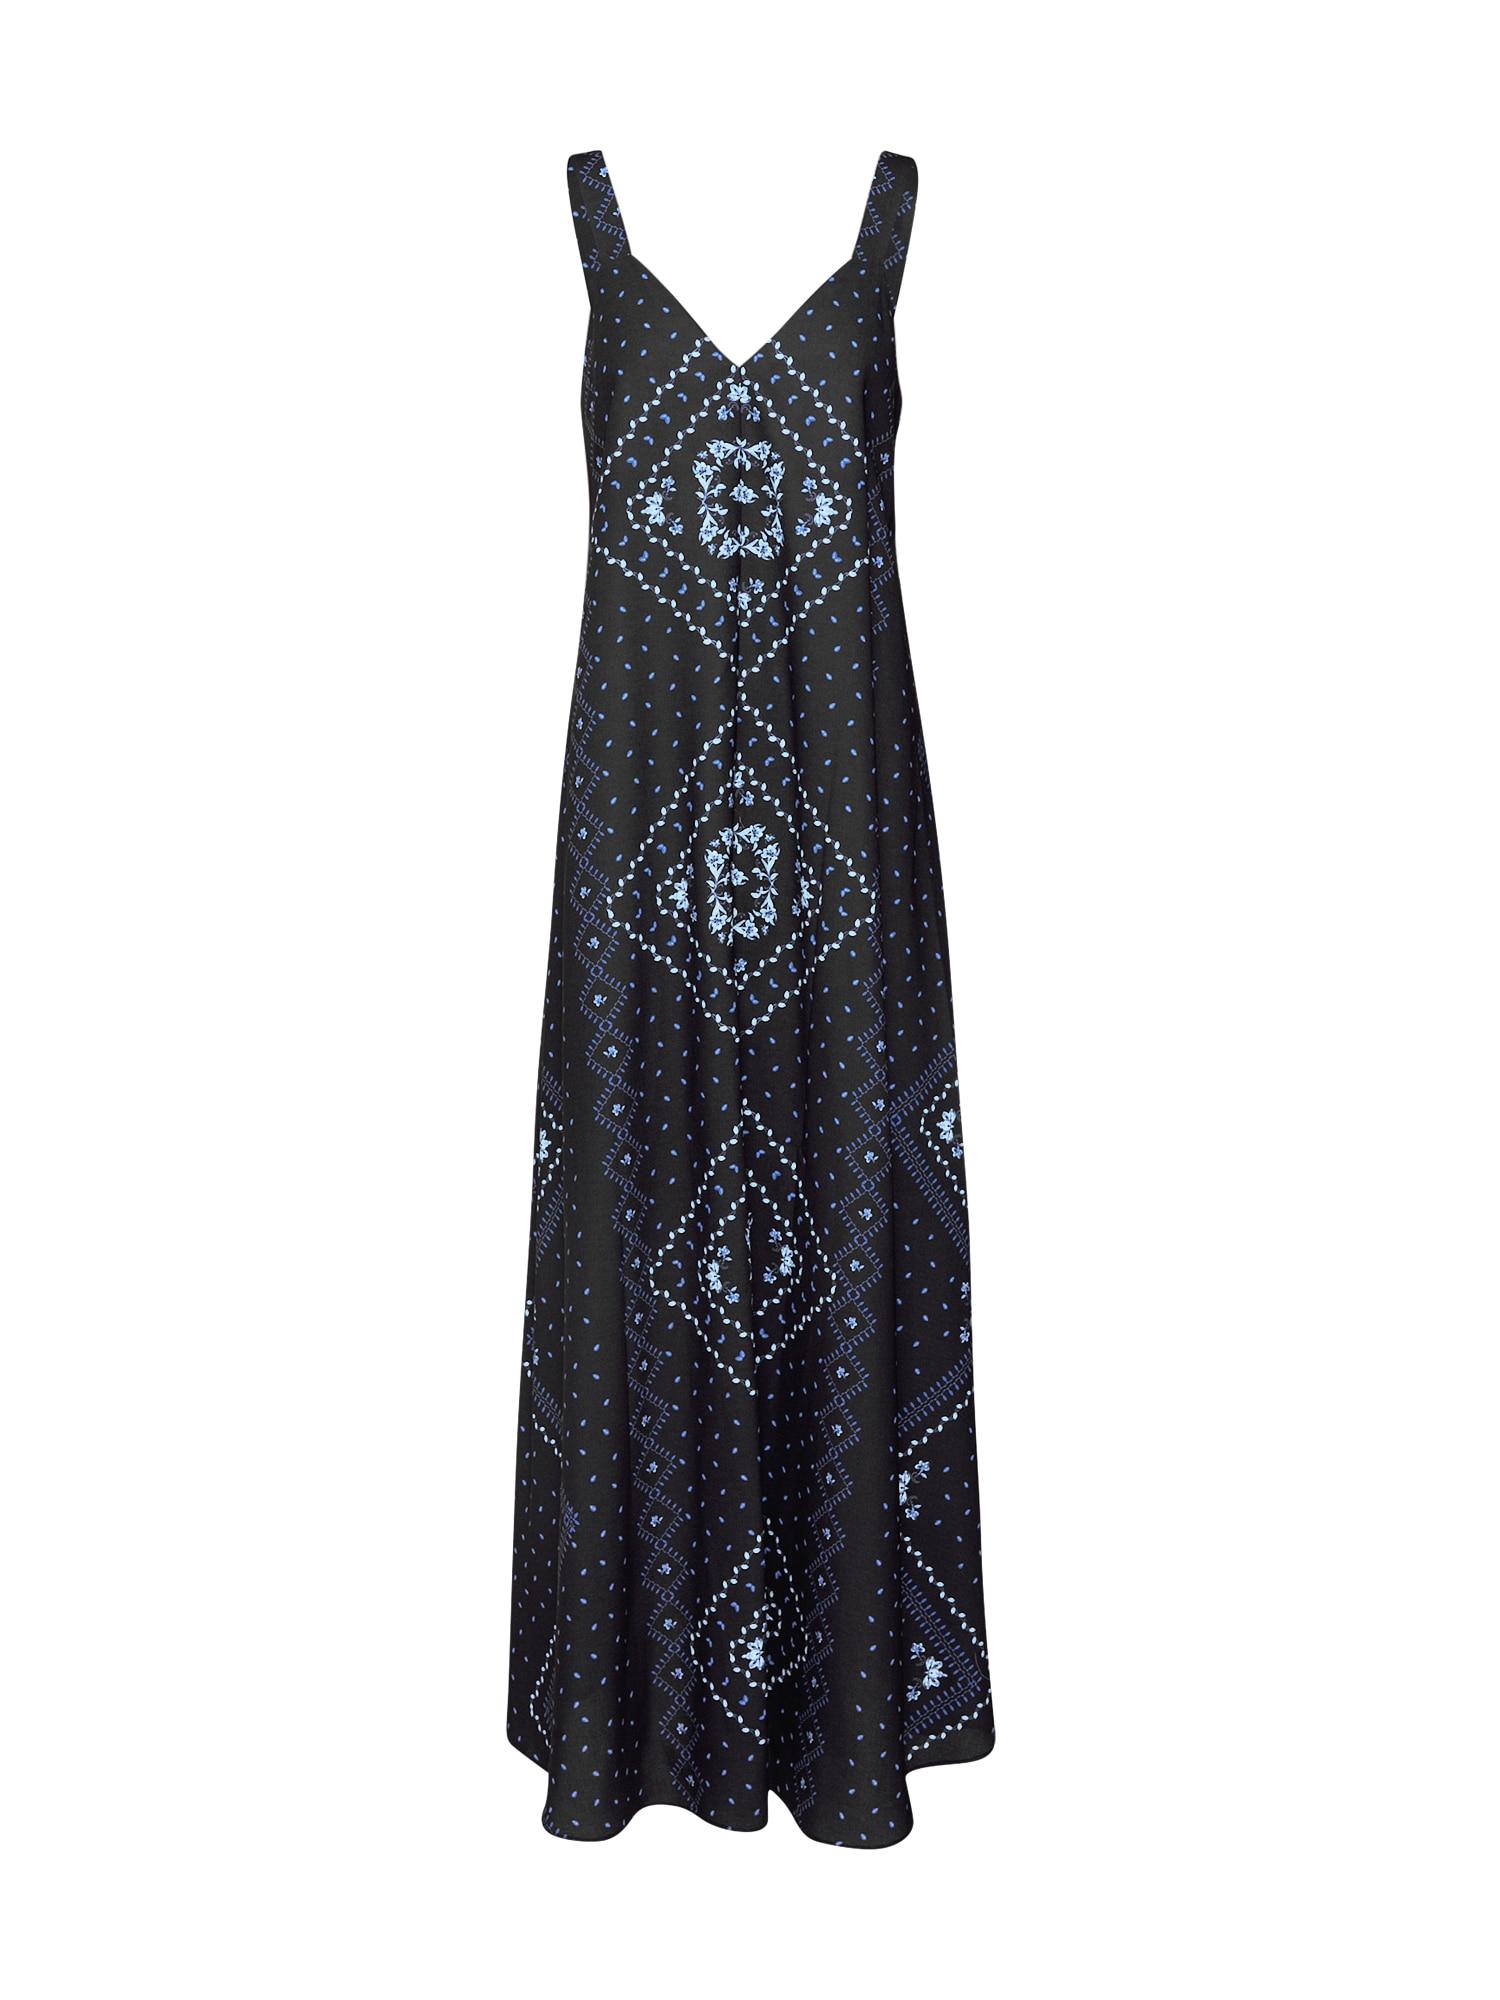 EDITED Suknelė 'Annalie' mėlyna / juoda / balta